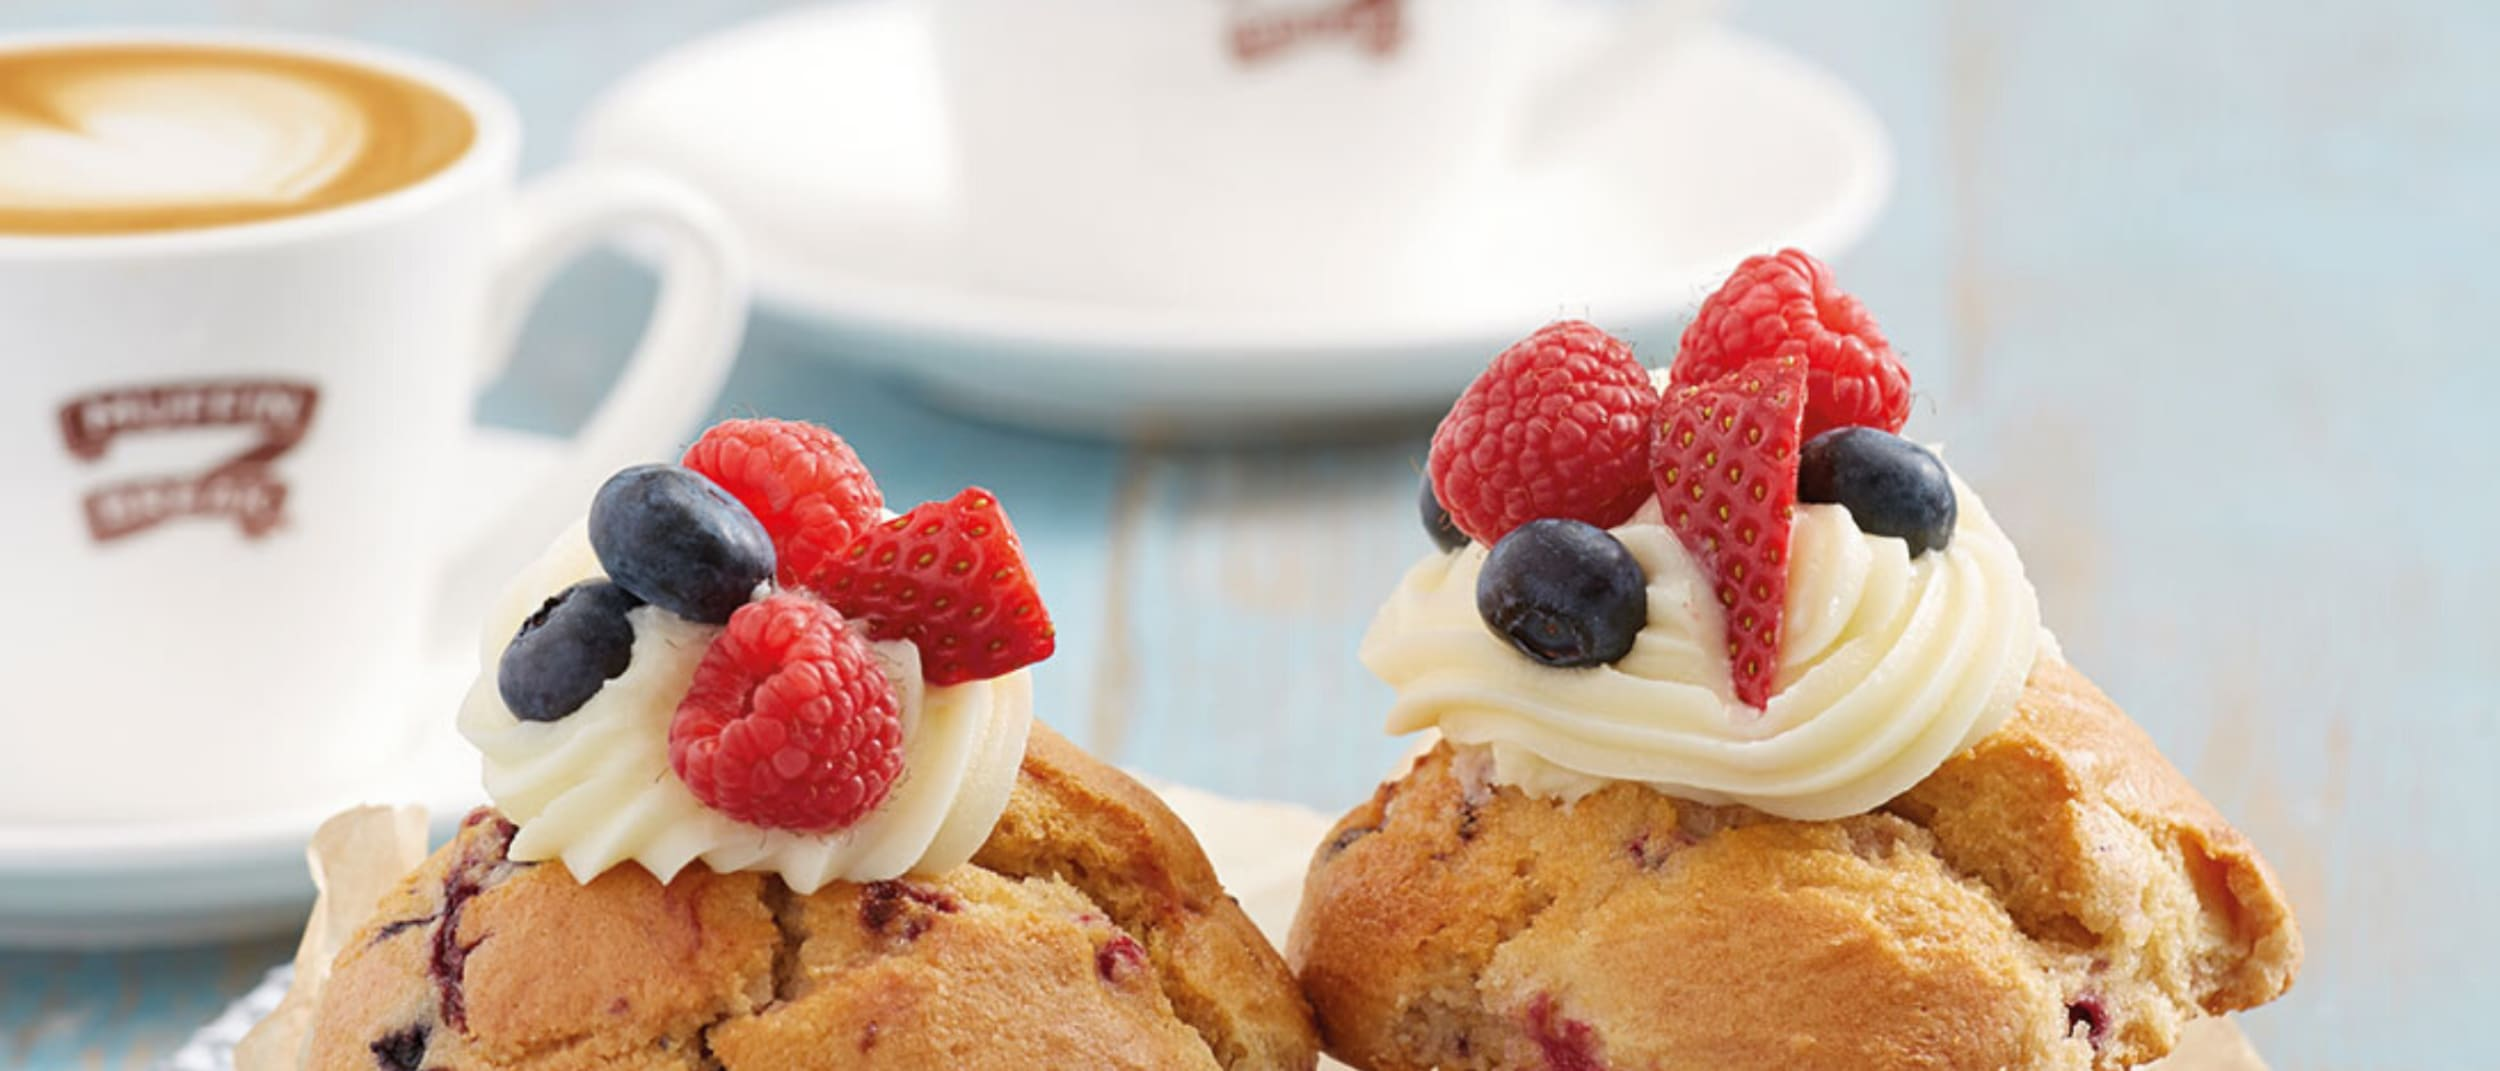 Muffin Break: Rewards app